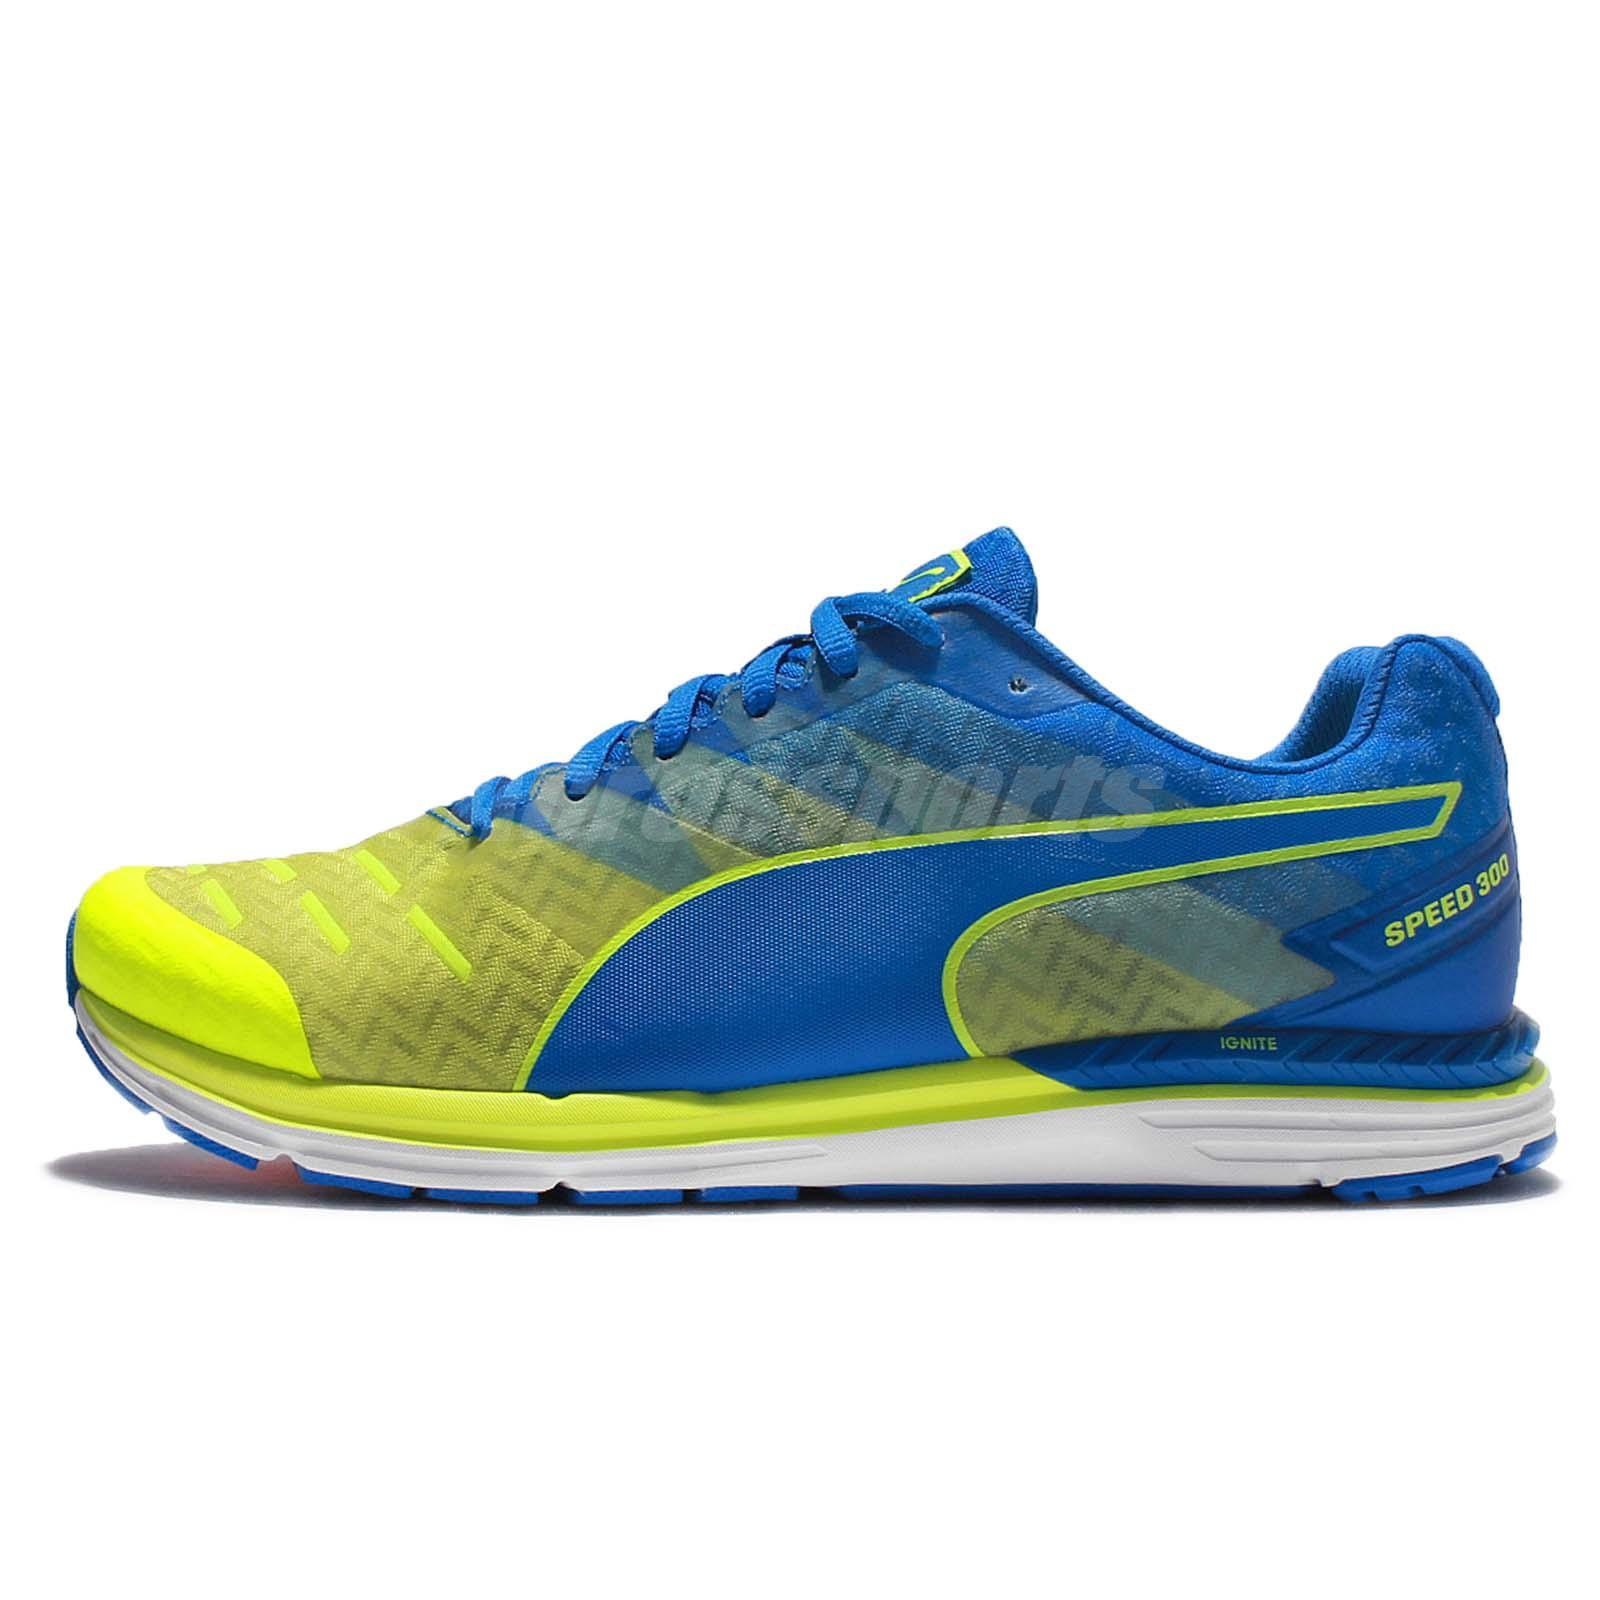 Puma Speed 300 Ignite Yellow Blue Mens Running Shoes Sneakers Runner  188114-08